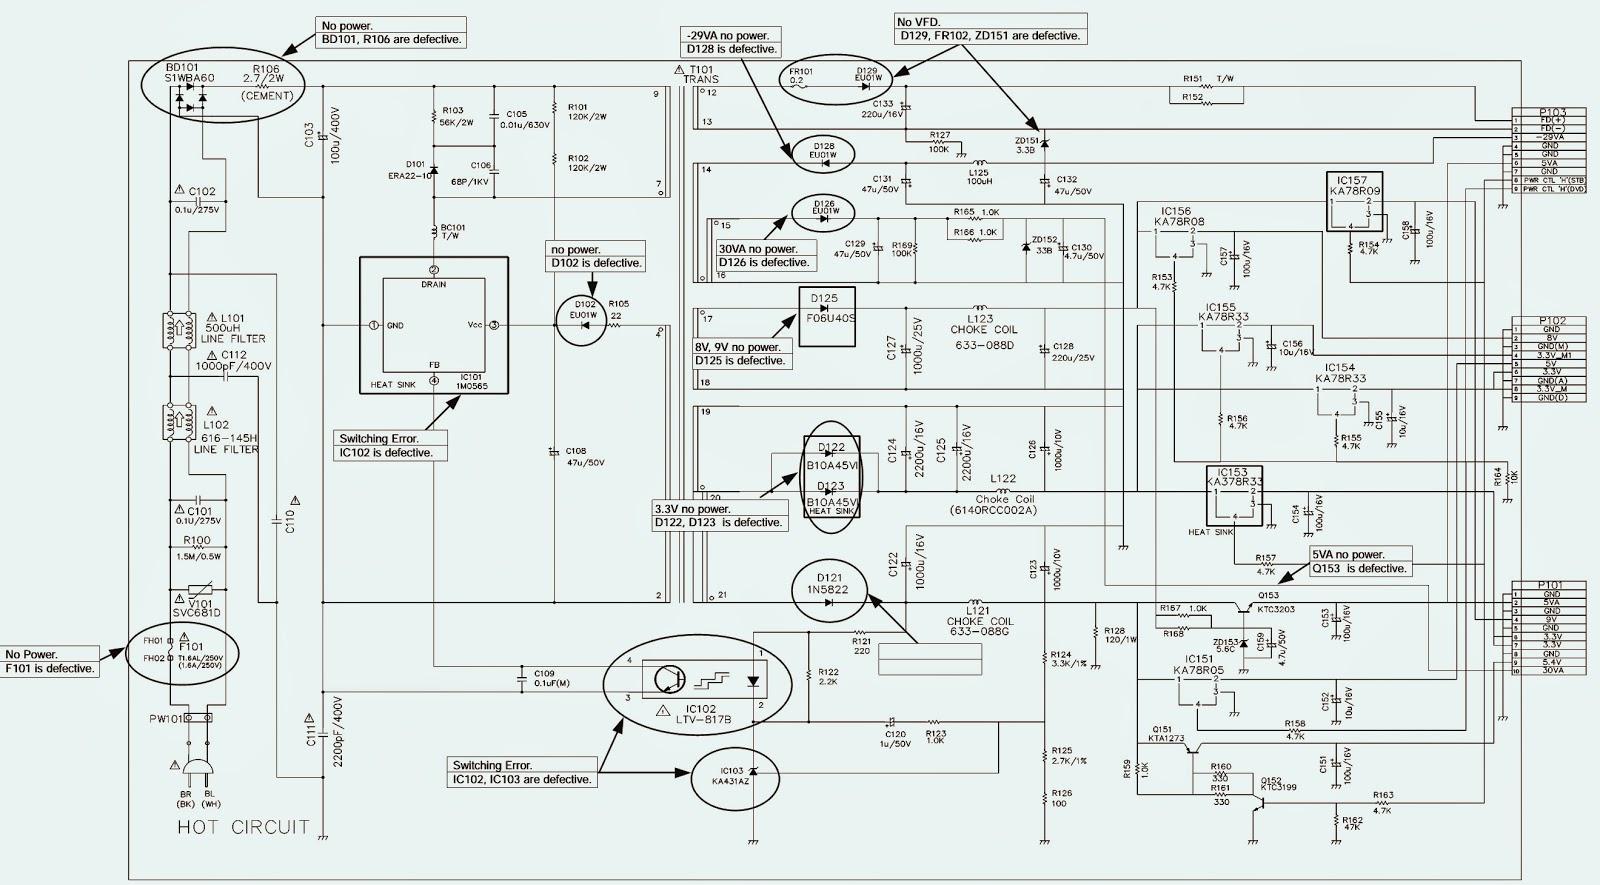 lg lst 3510a set top box circuit diagram [ 1600 x 885 Pixel ]